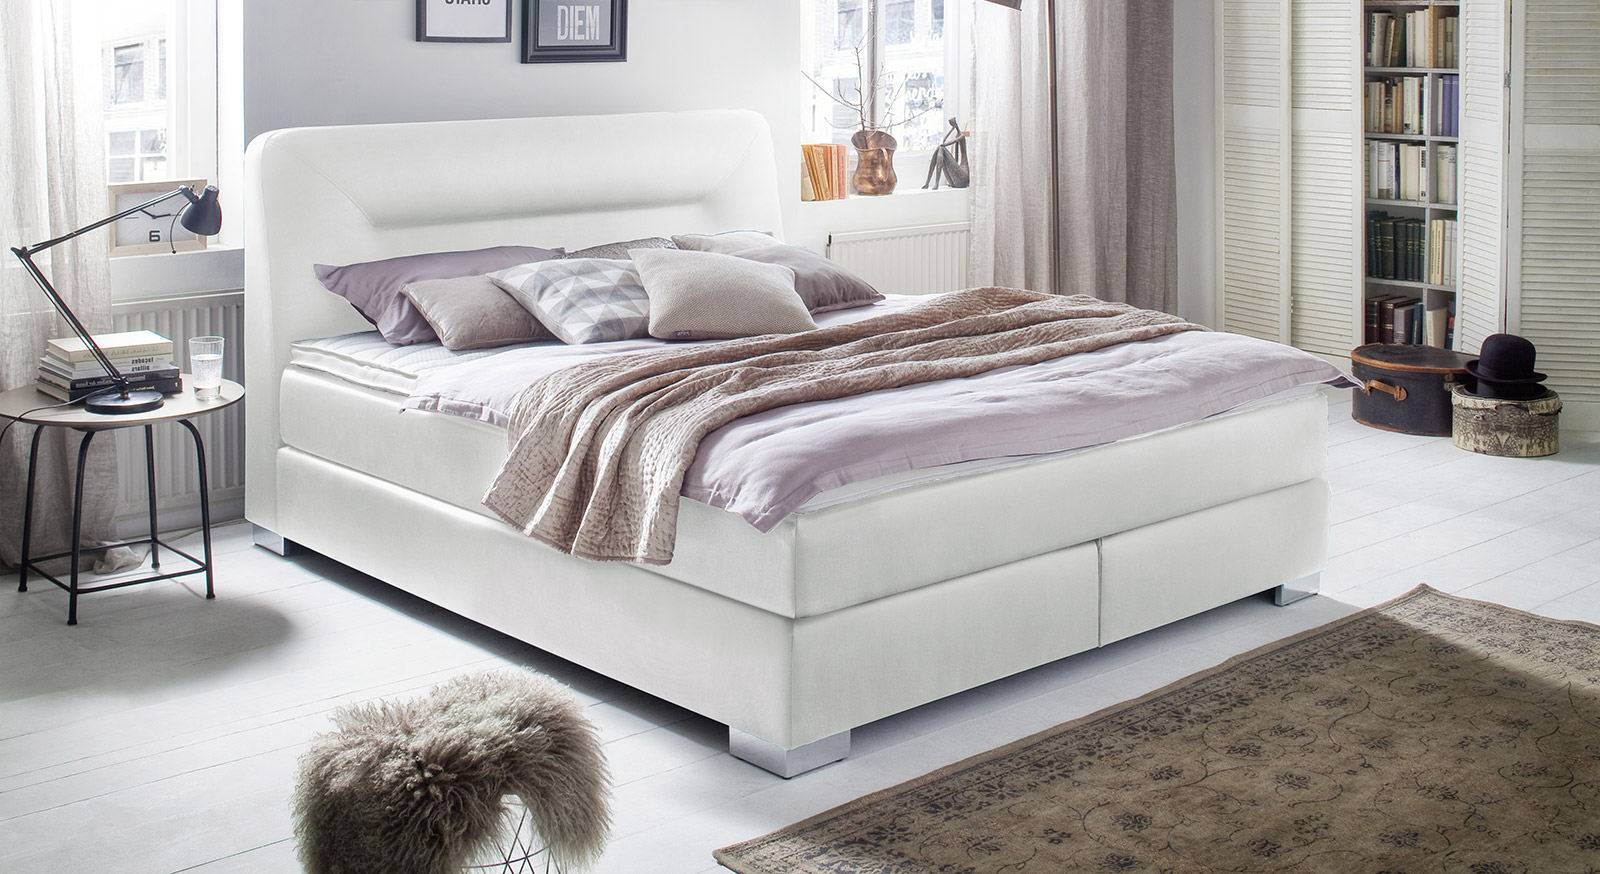 boxspringbett topper bezug boxspringbett topper bezug boxspringbett inkl topper schlafzimmer. Black Bedroom Furniture Sets. Home Design Ideas